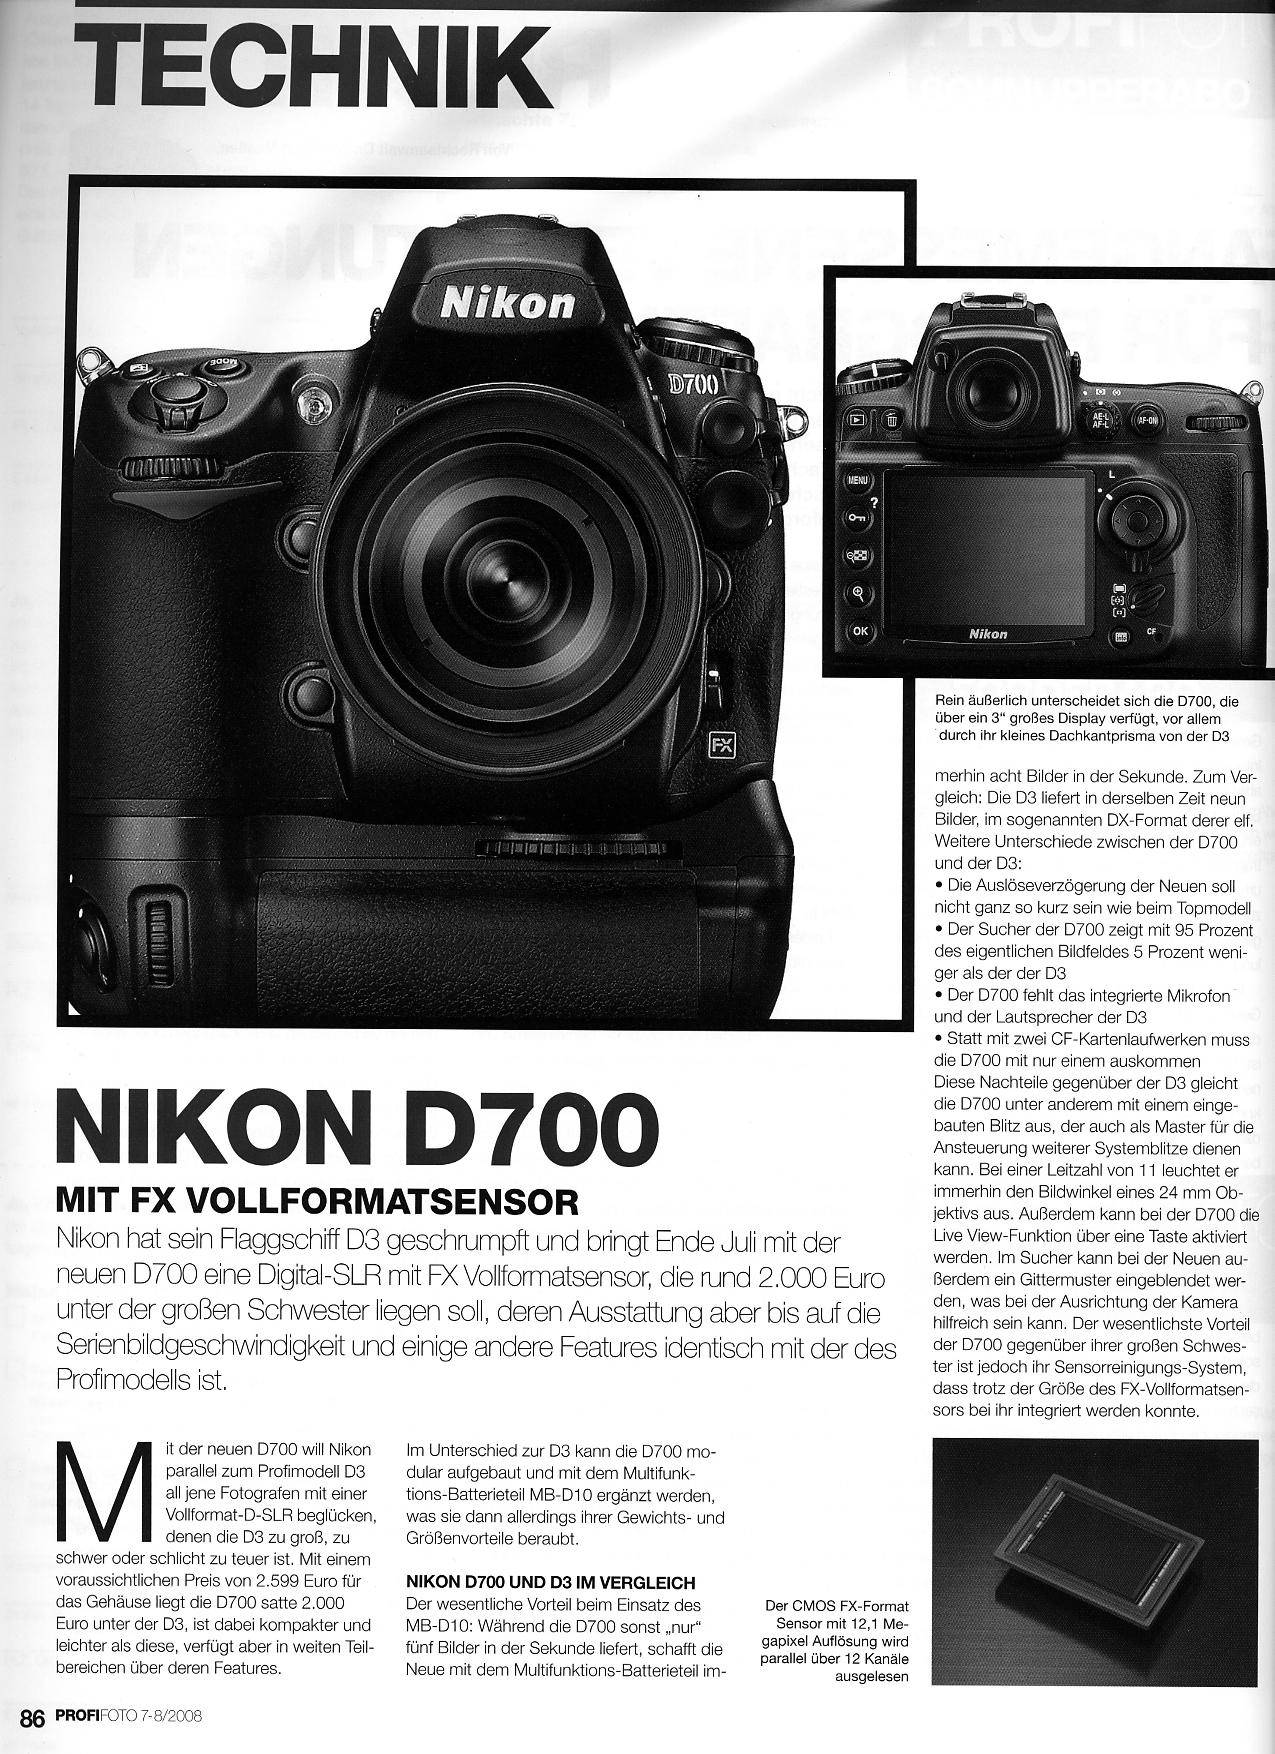 NIKON D700 PRICE WATCH